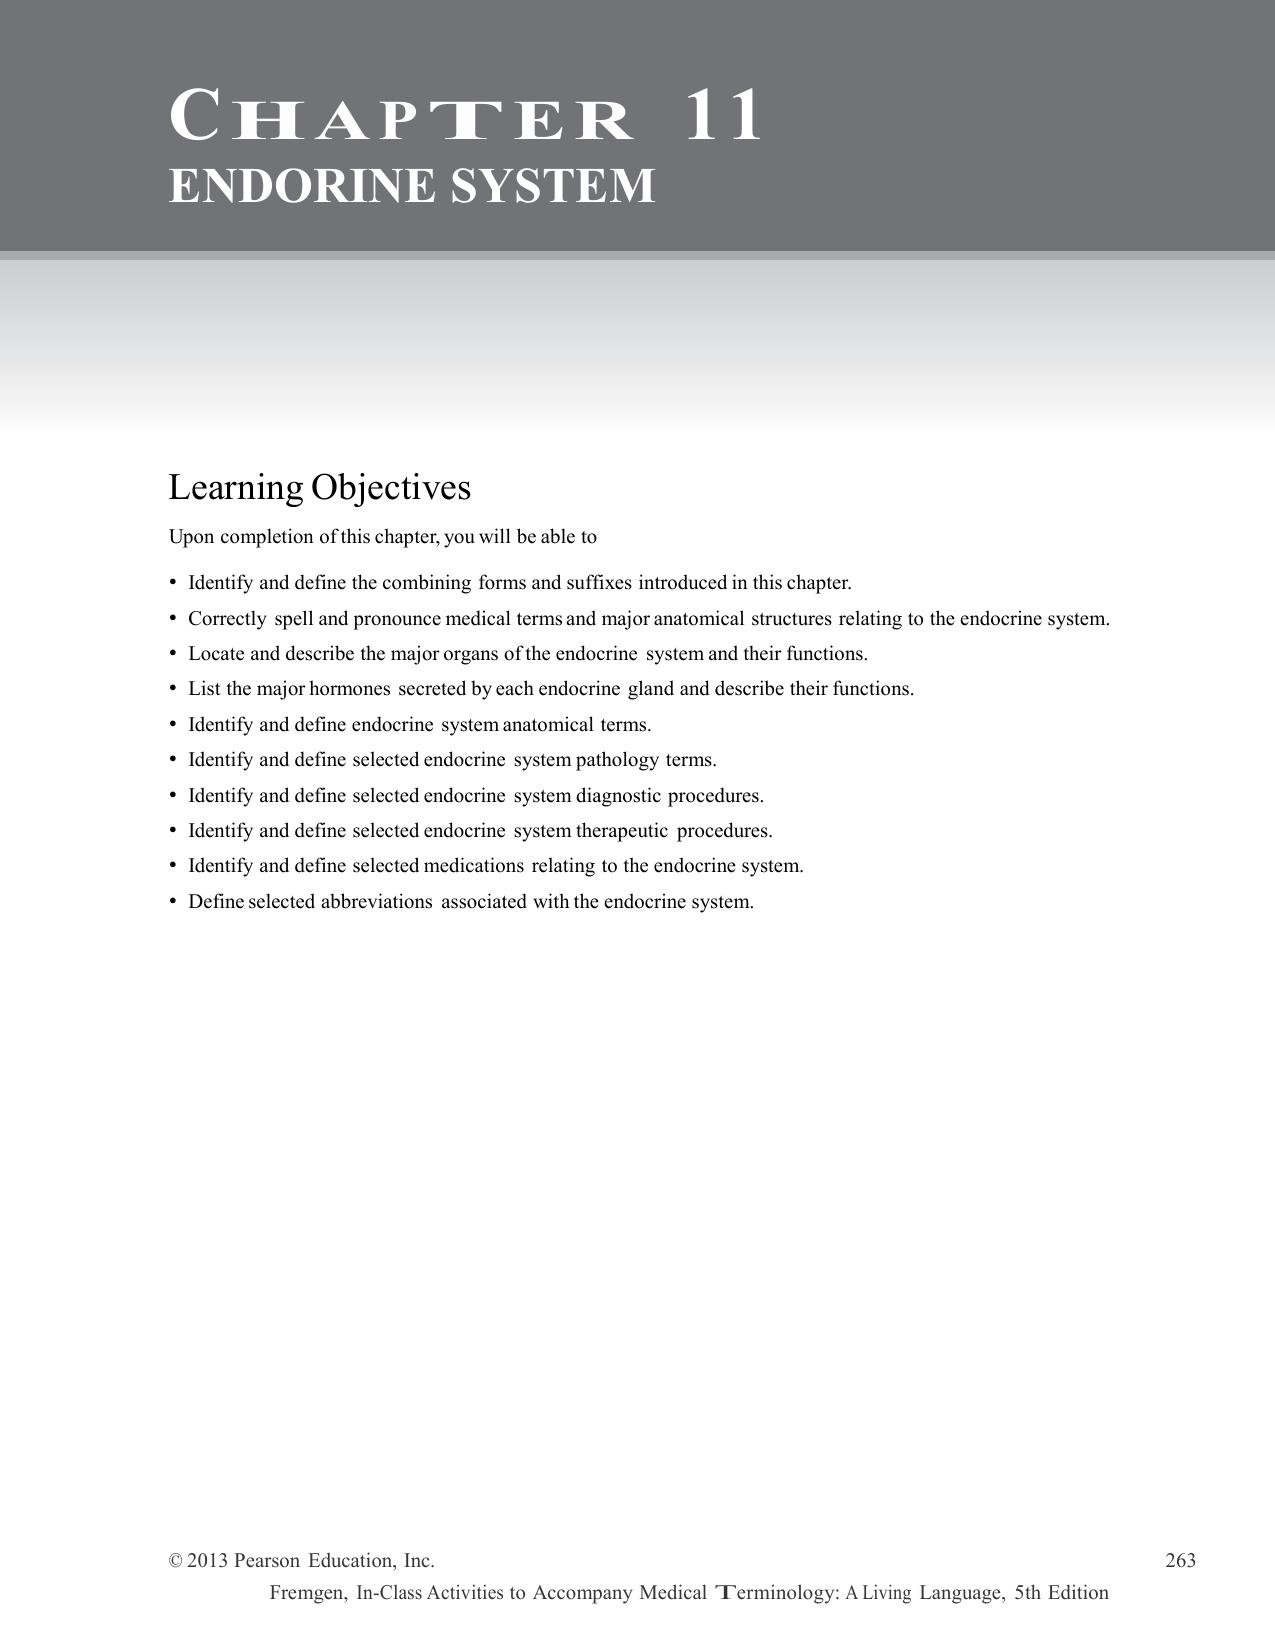 Worksheet Chapter 11